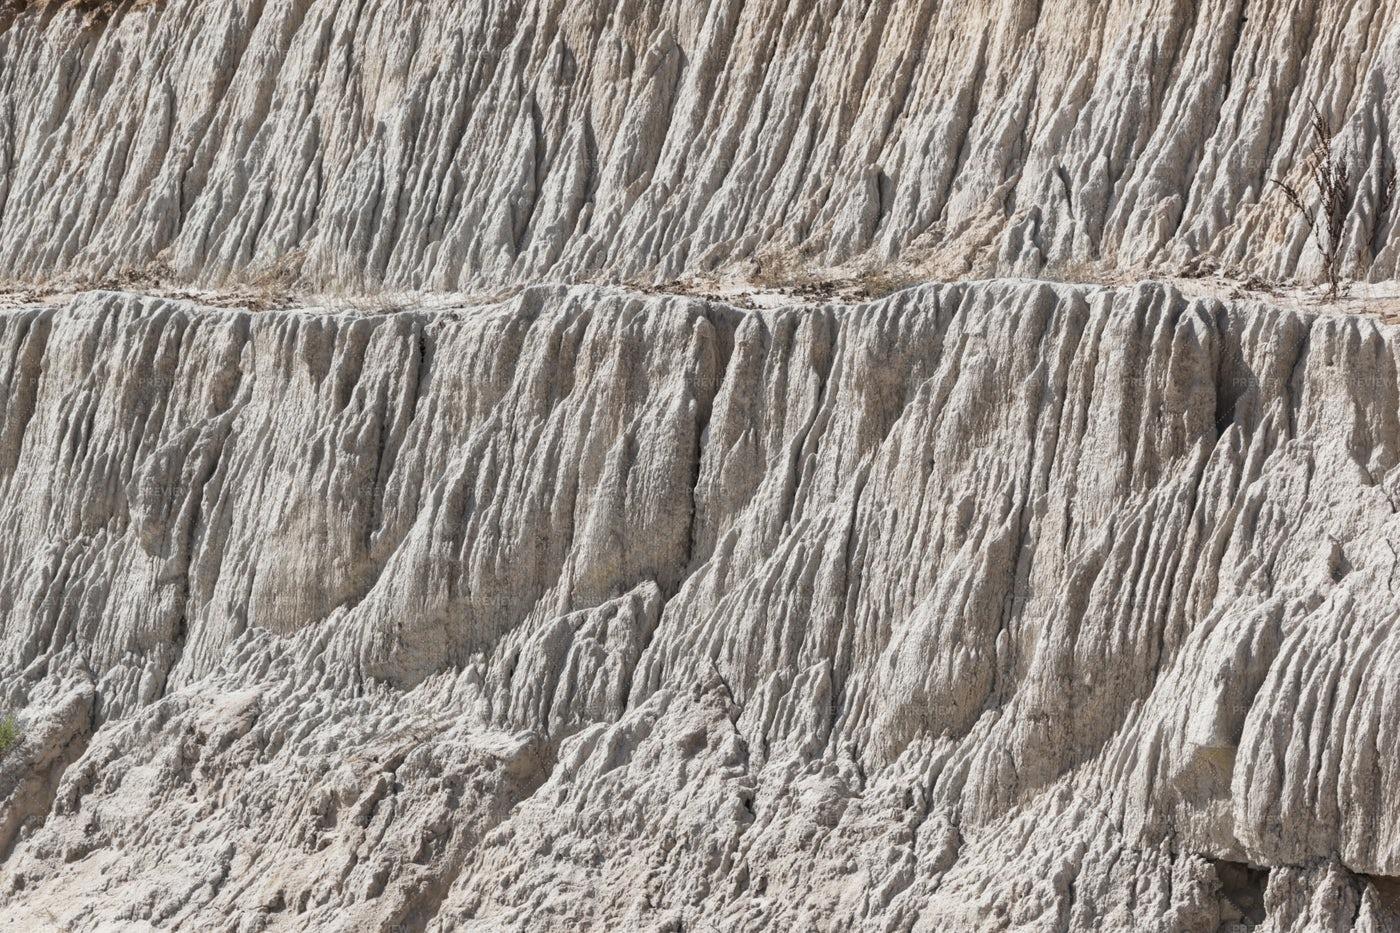 Texture Of Sand: Stock Photos